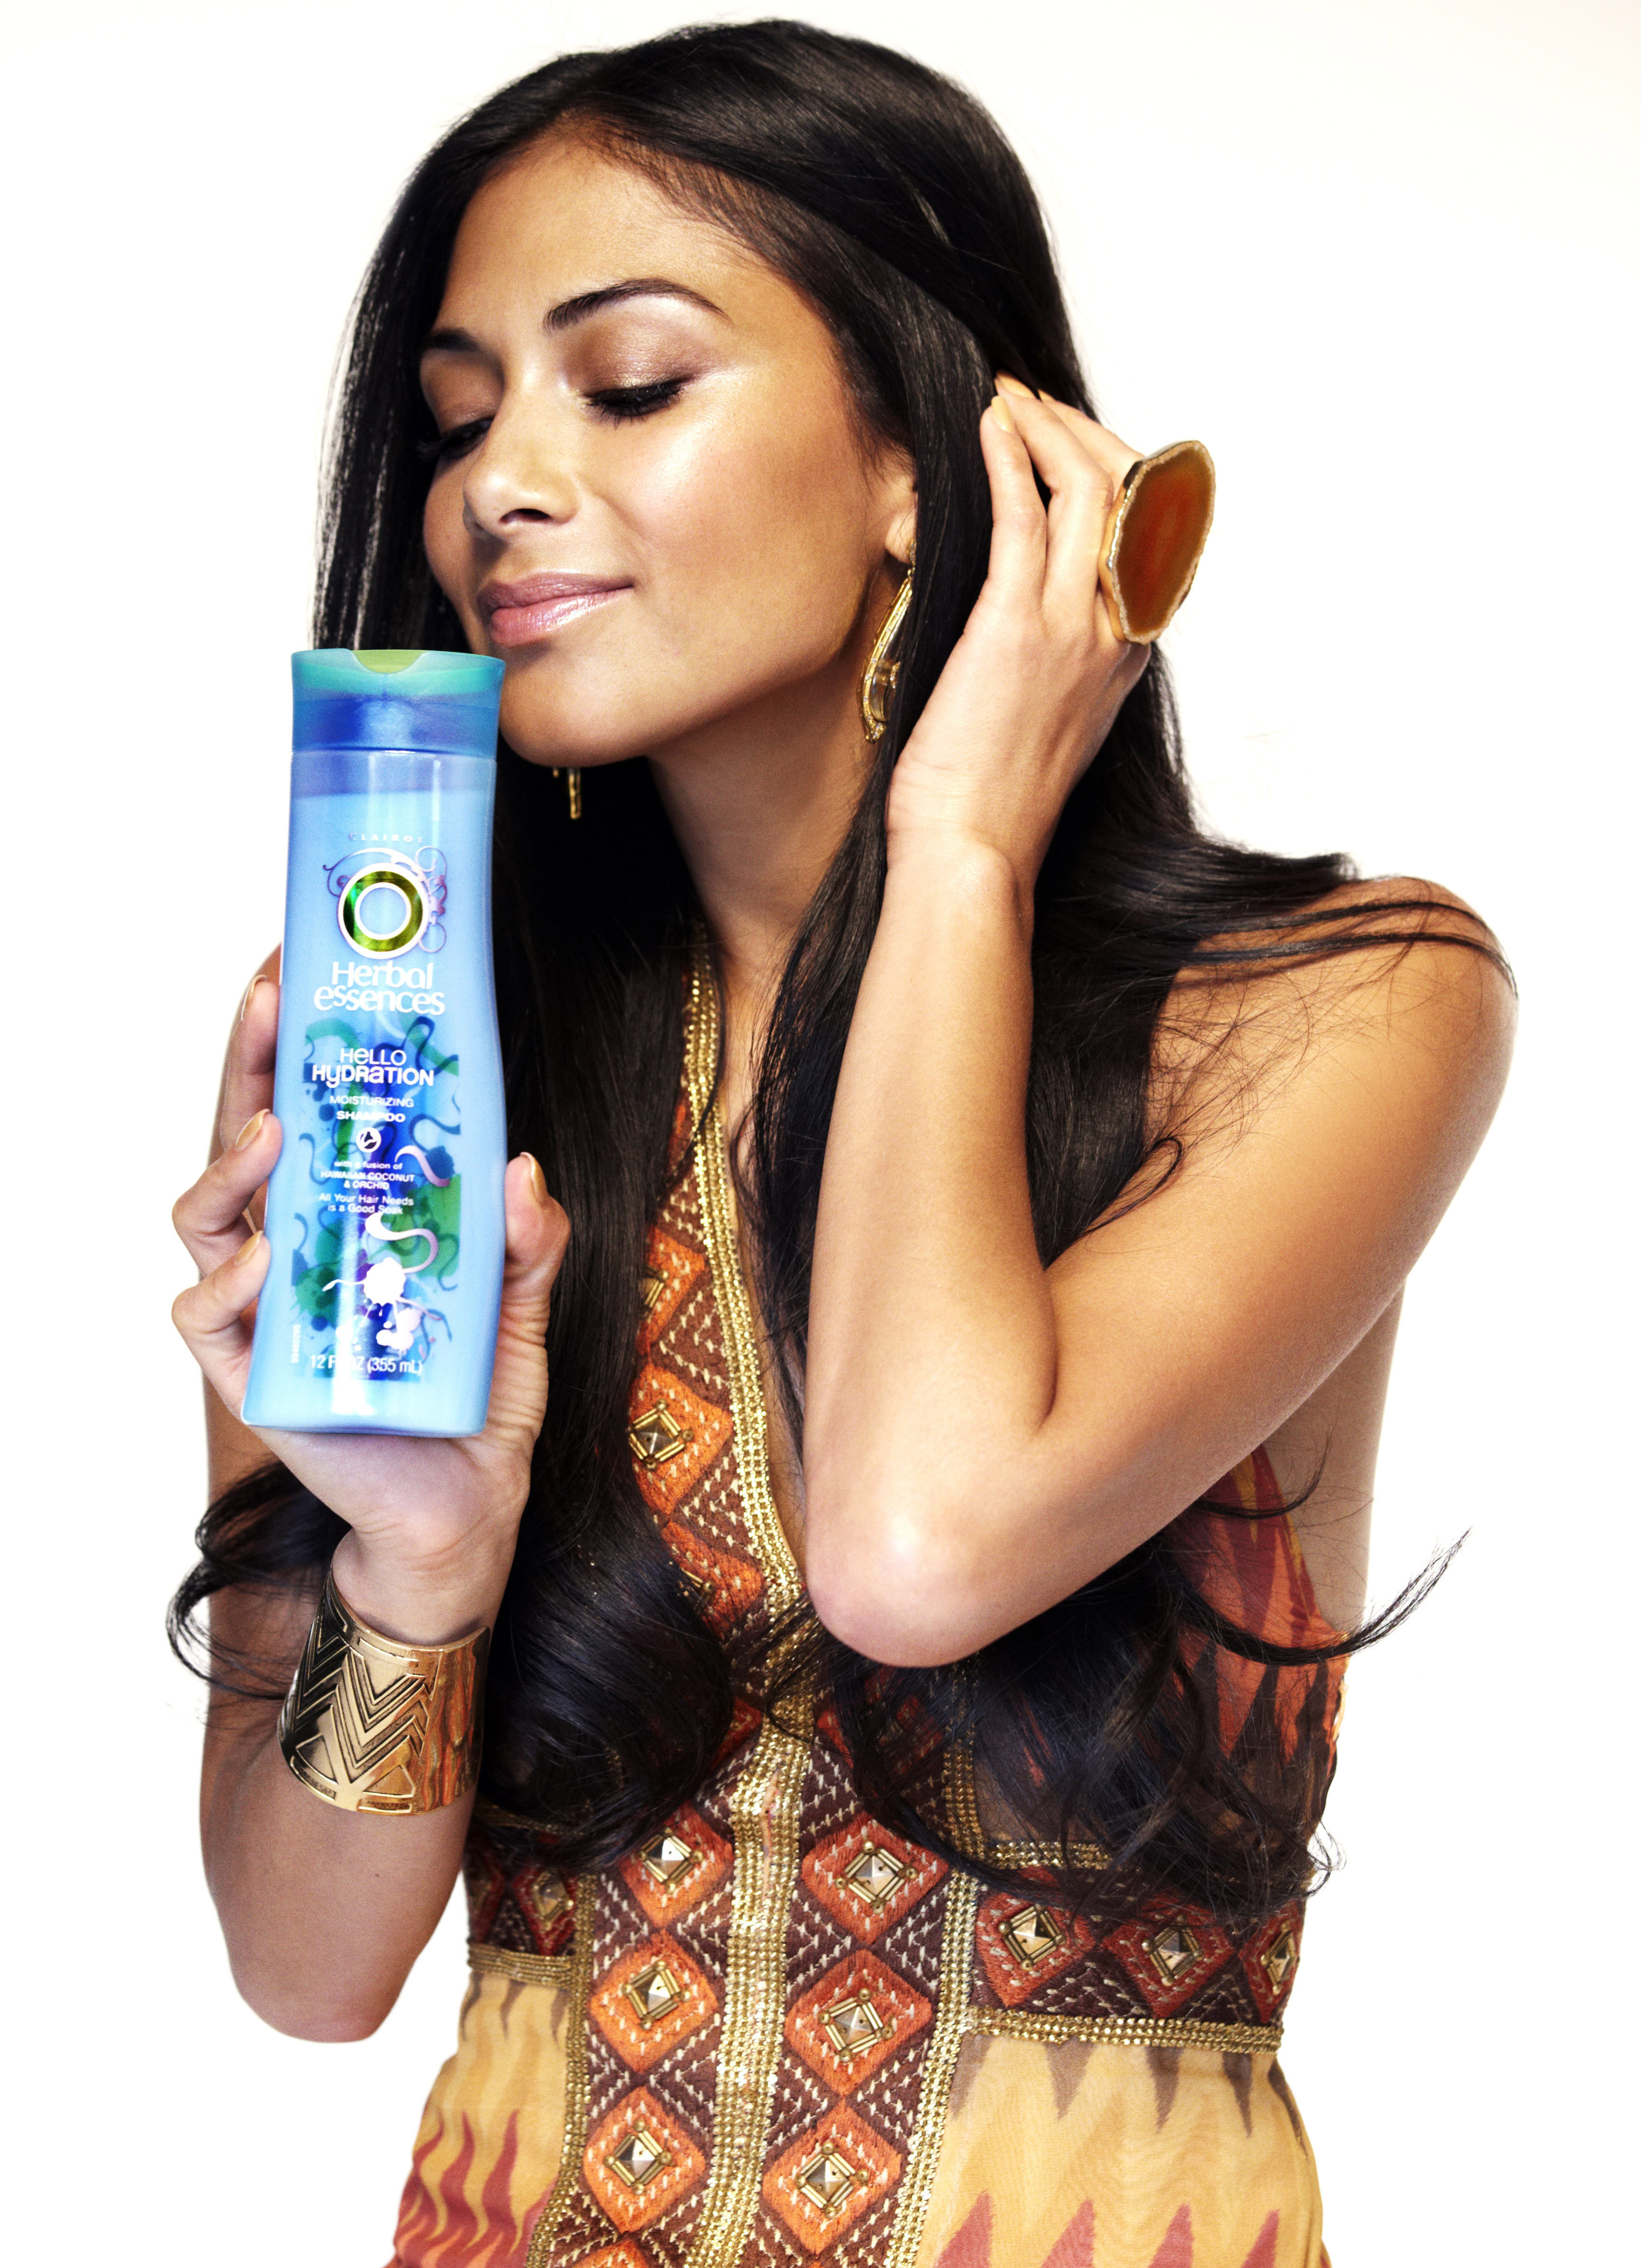 Biomed asian hair herbs